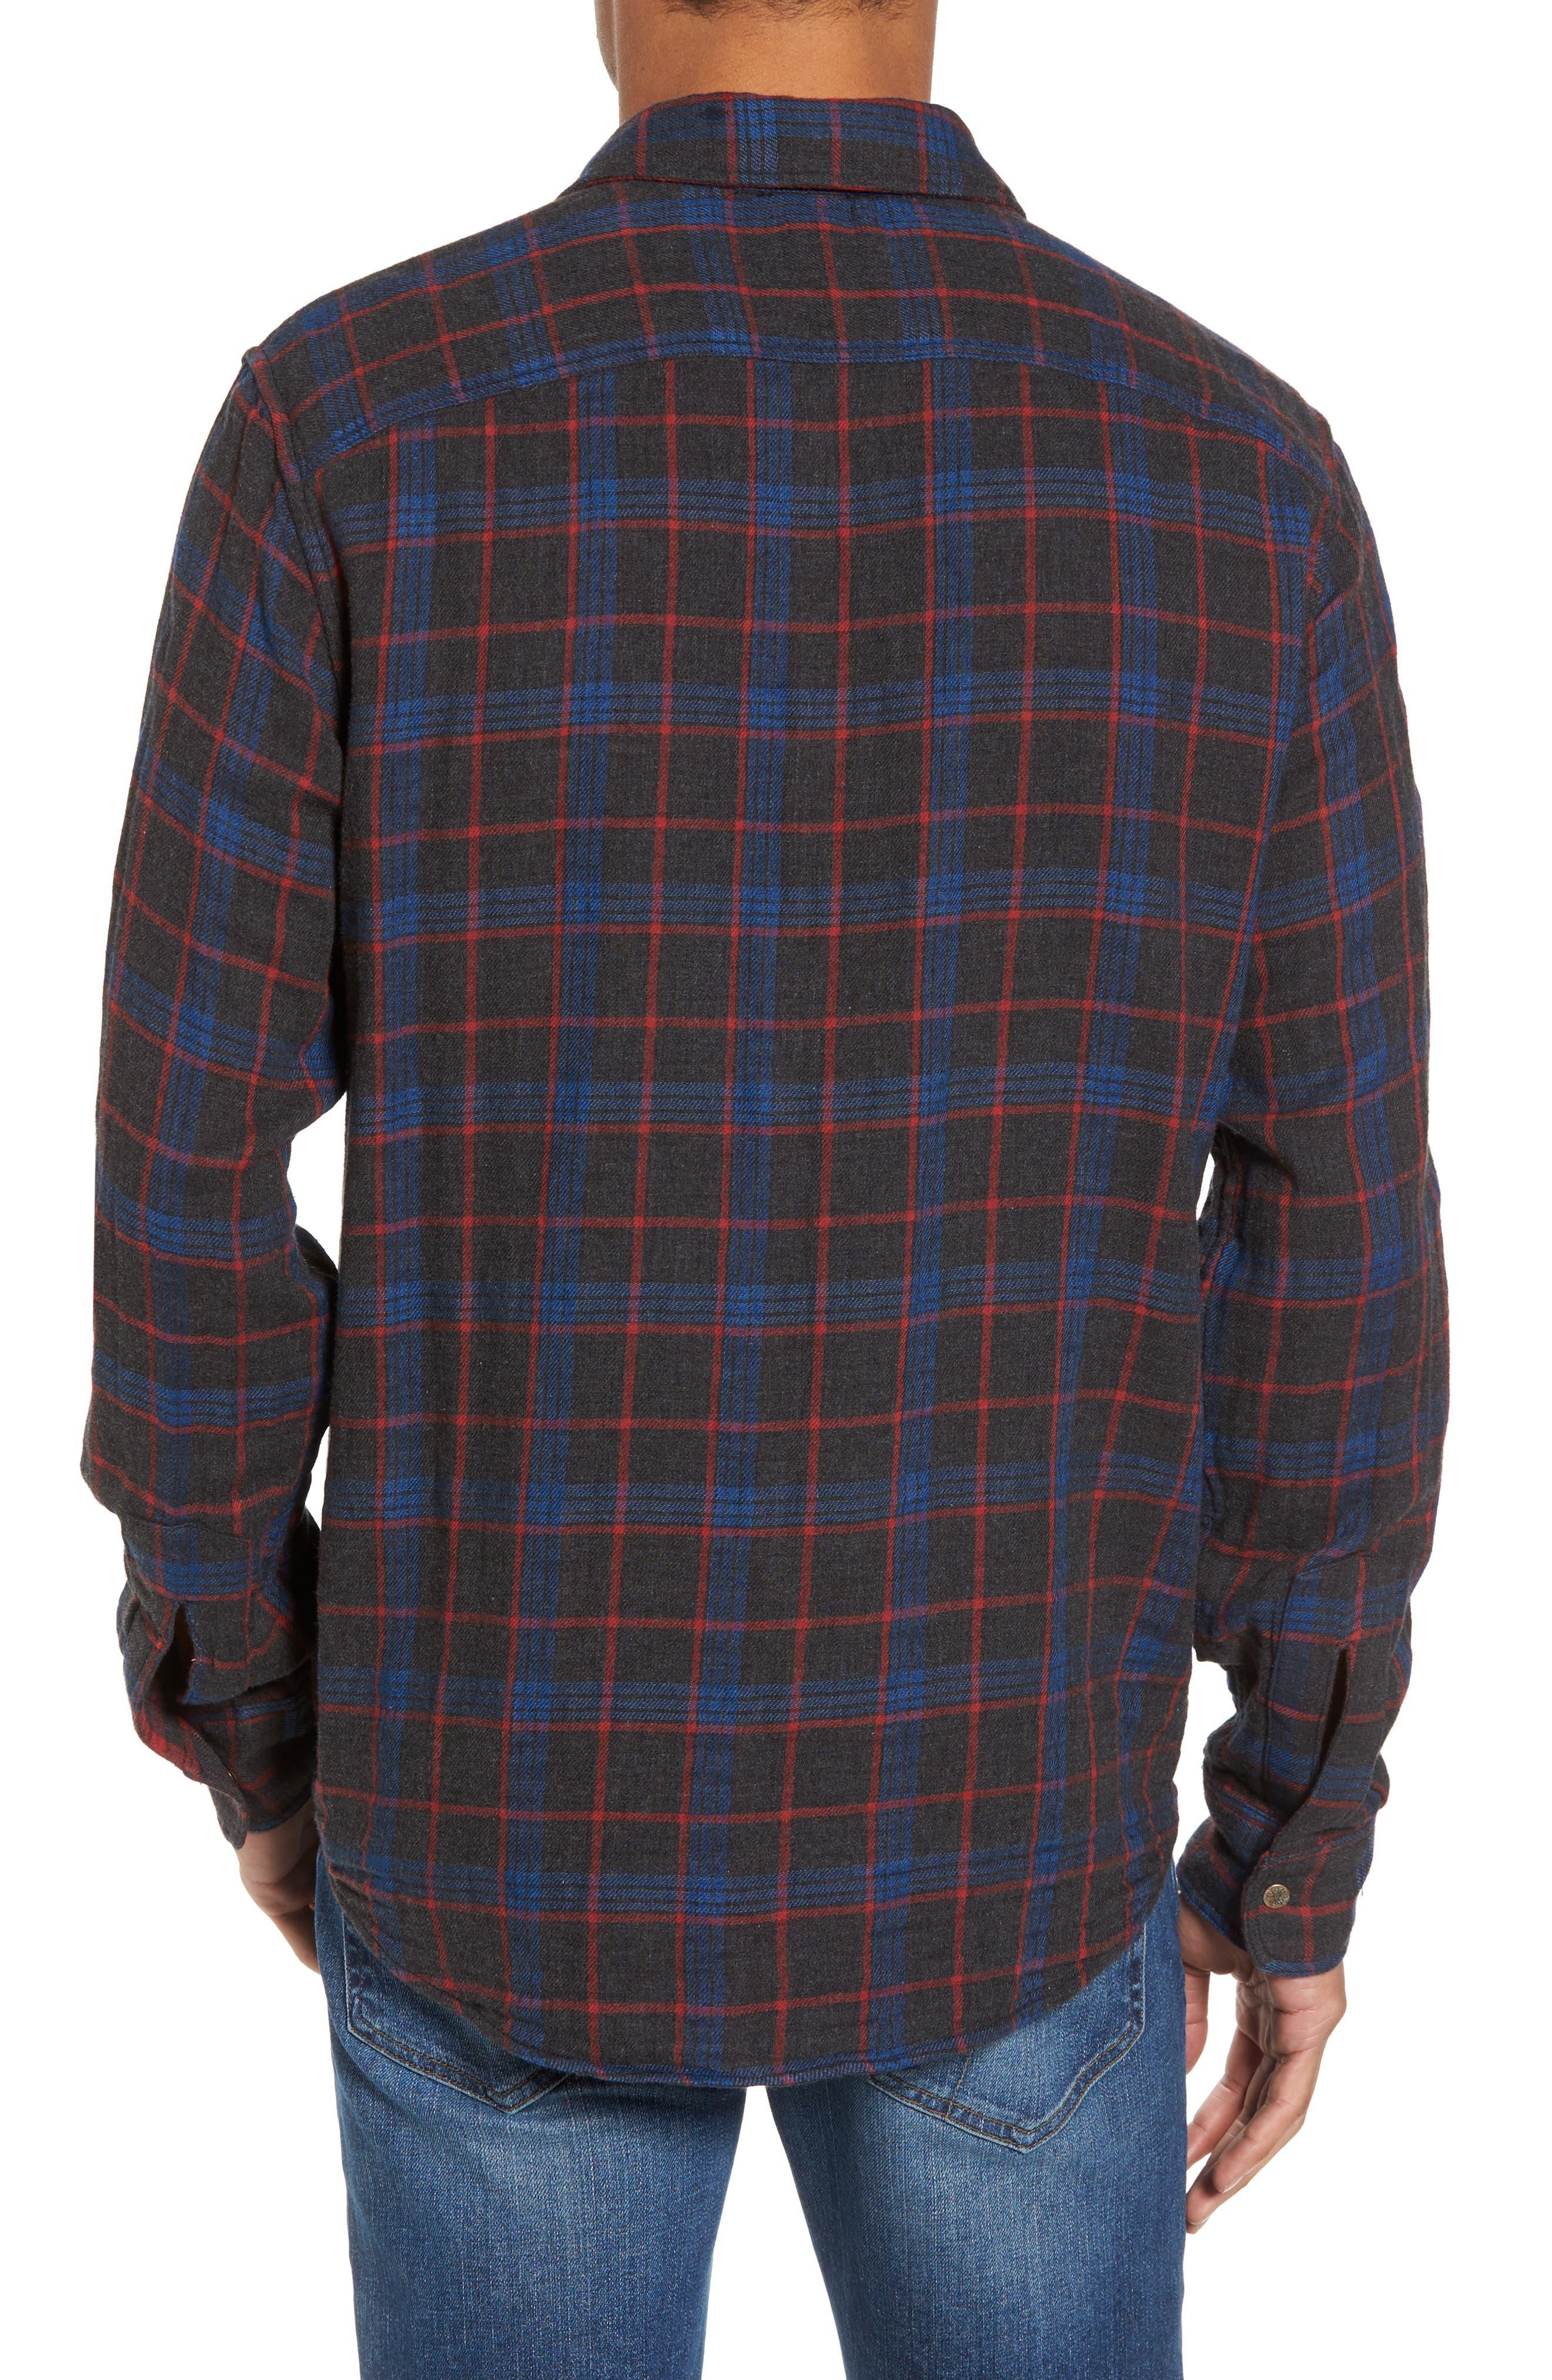 Belmar Plaid Reversible Sport Shirt,                             Alternate thumbnail 3, color,                             Charcoal Blue Red Plaid